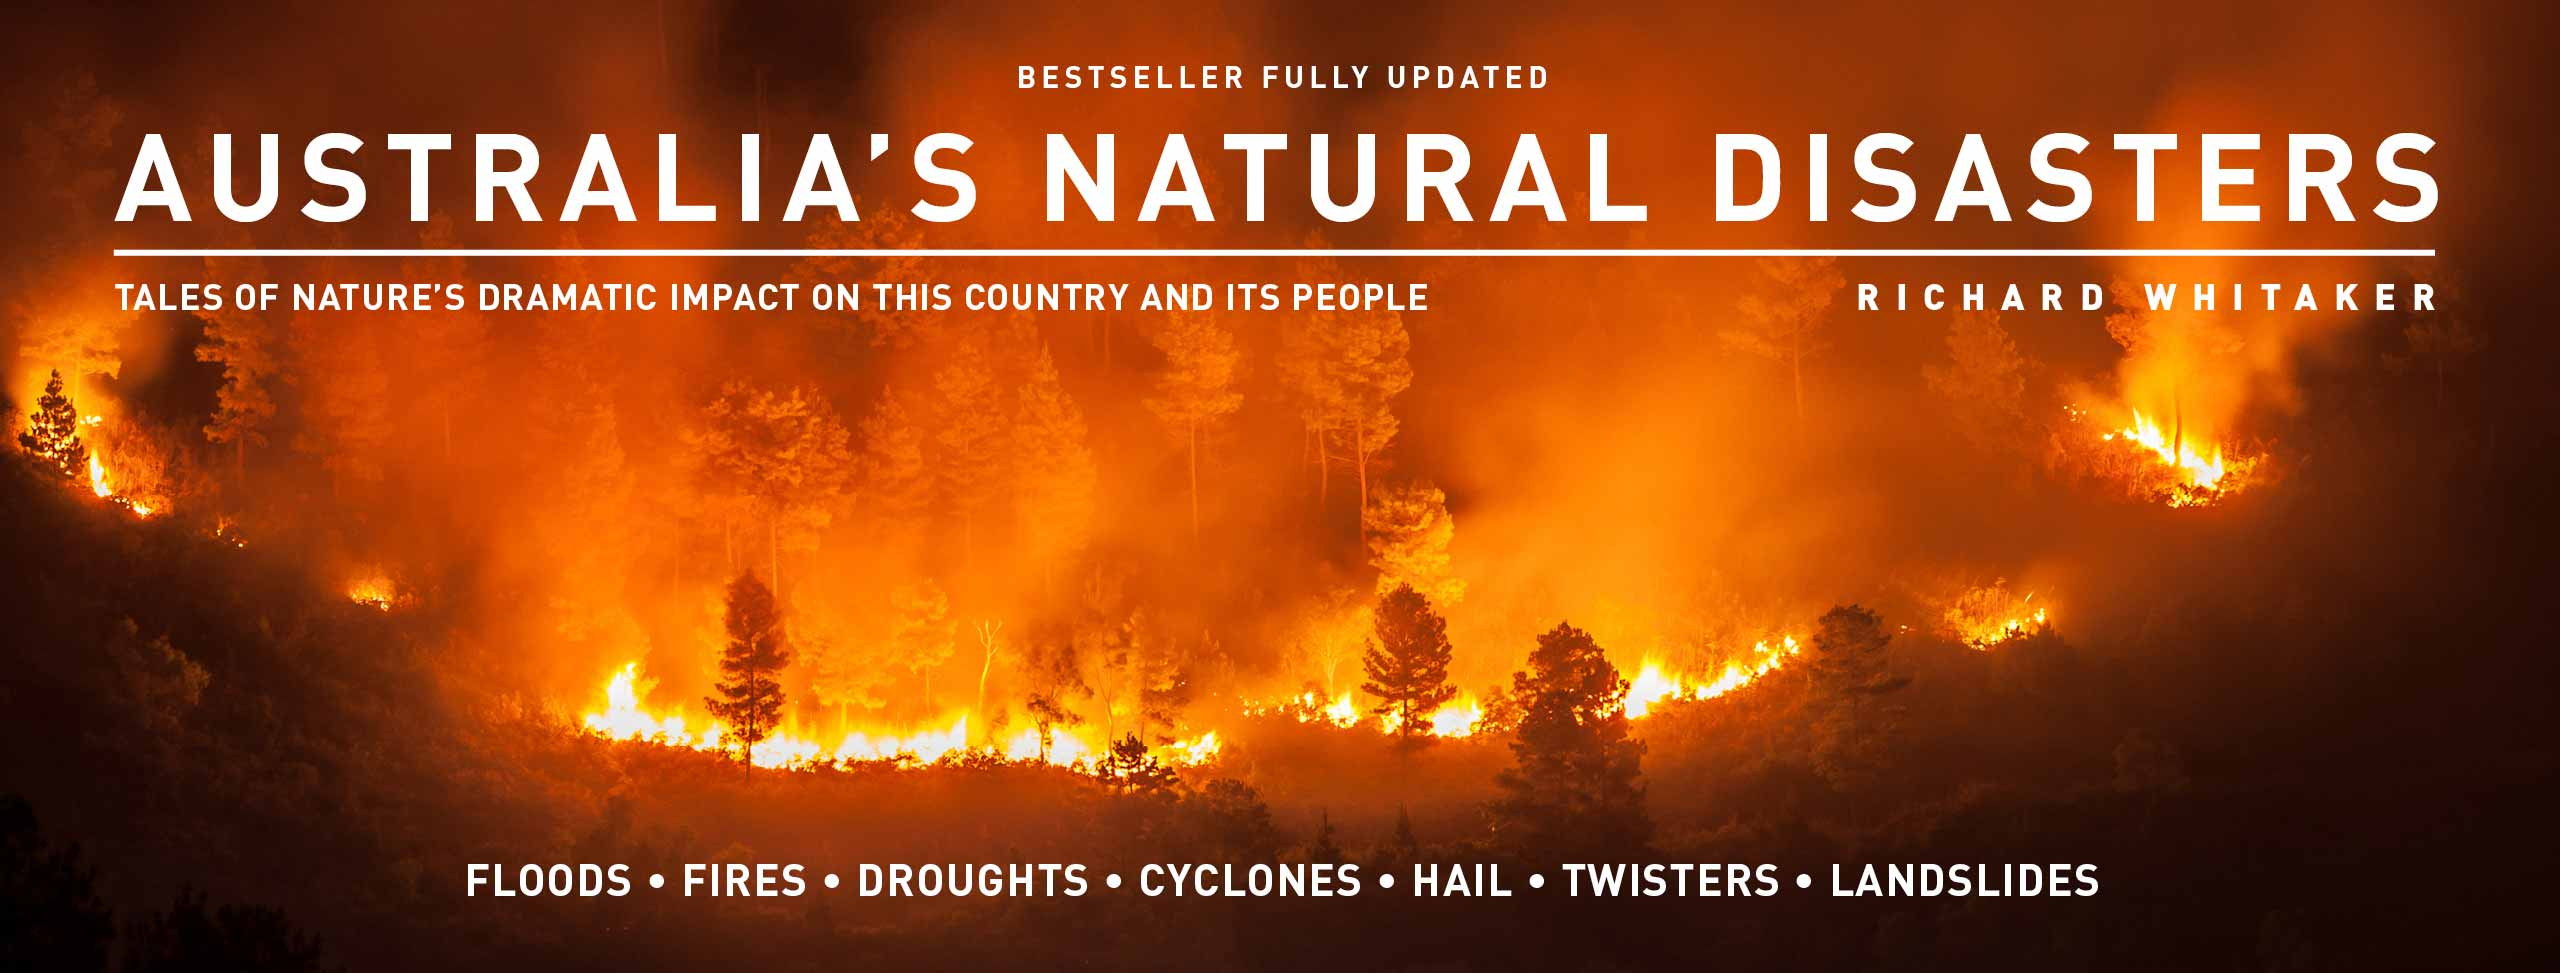 Australia's Natural Disasters